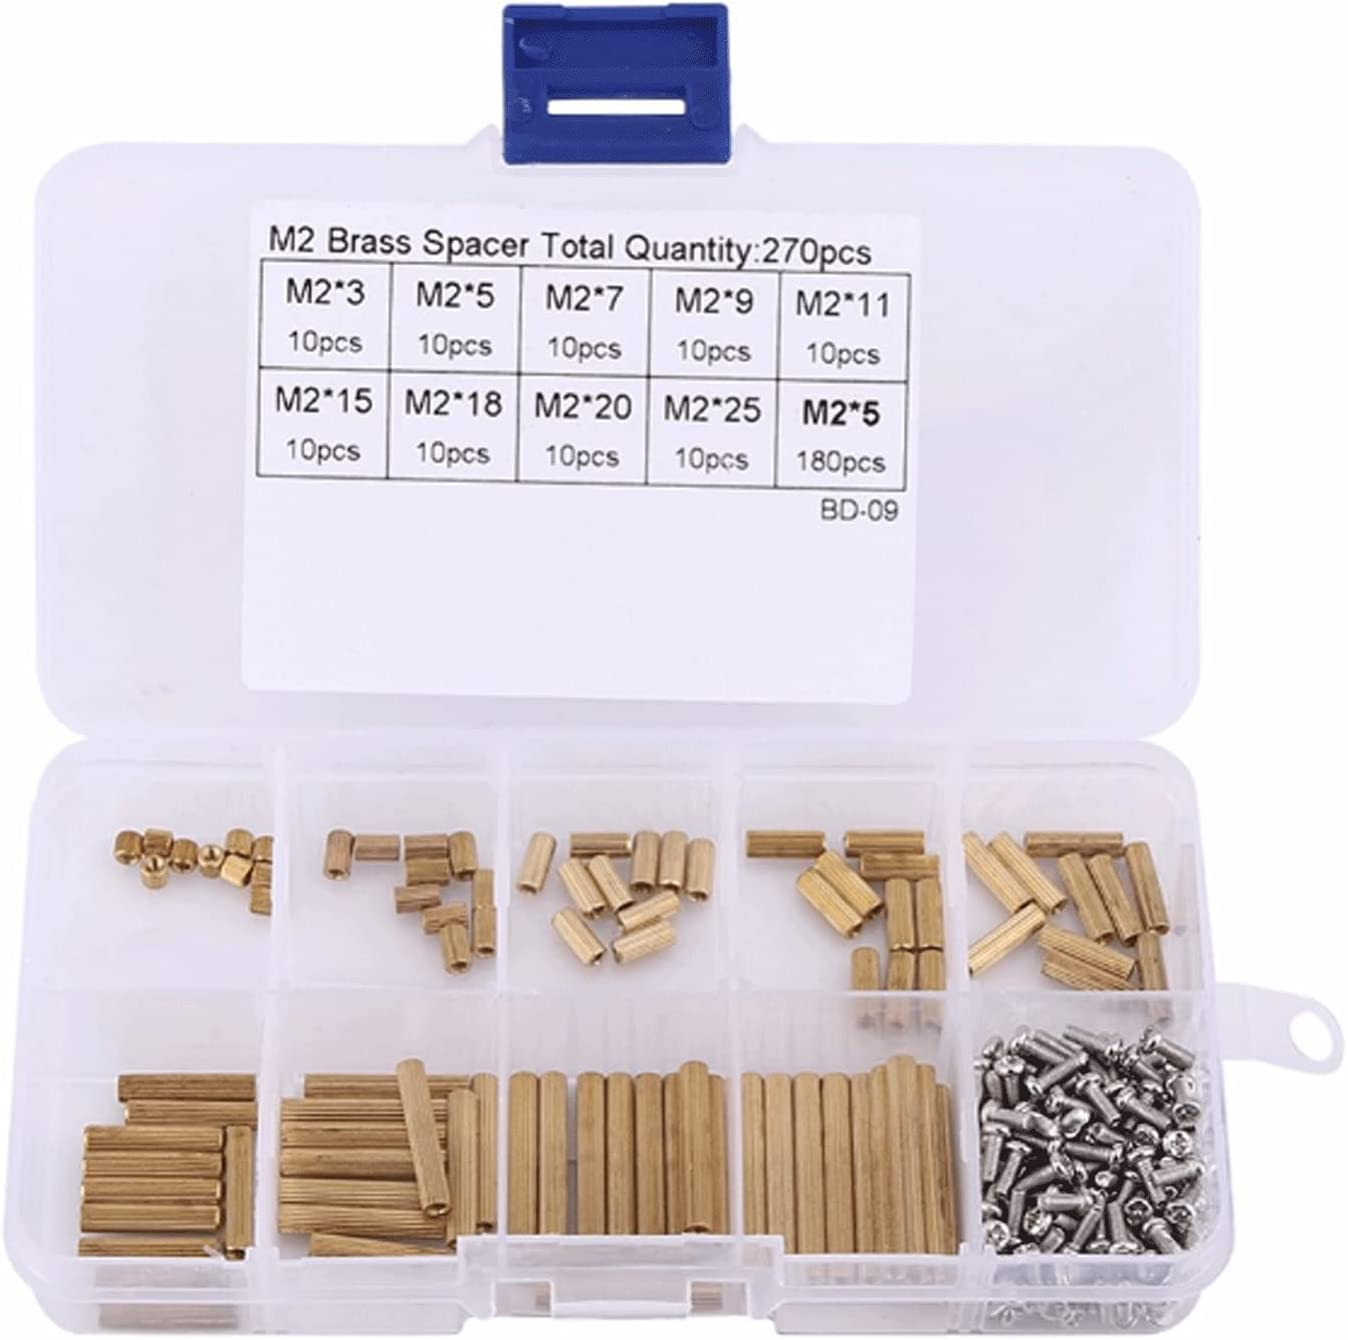 JNOIHF M2 Max 52% OFF Brass Purchase Hex Spacer Standoffs B Screw Assortment Kit Nut